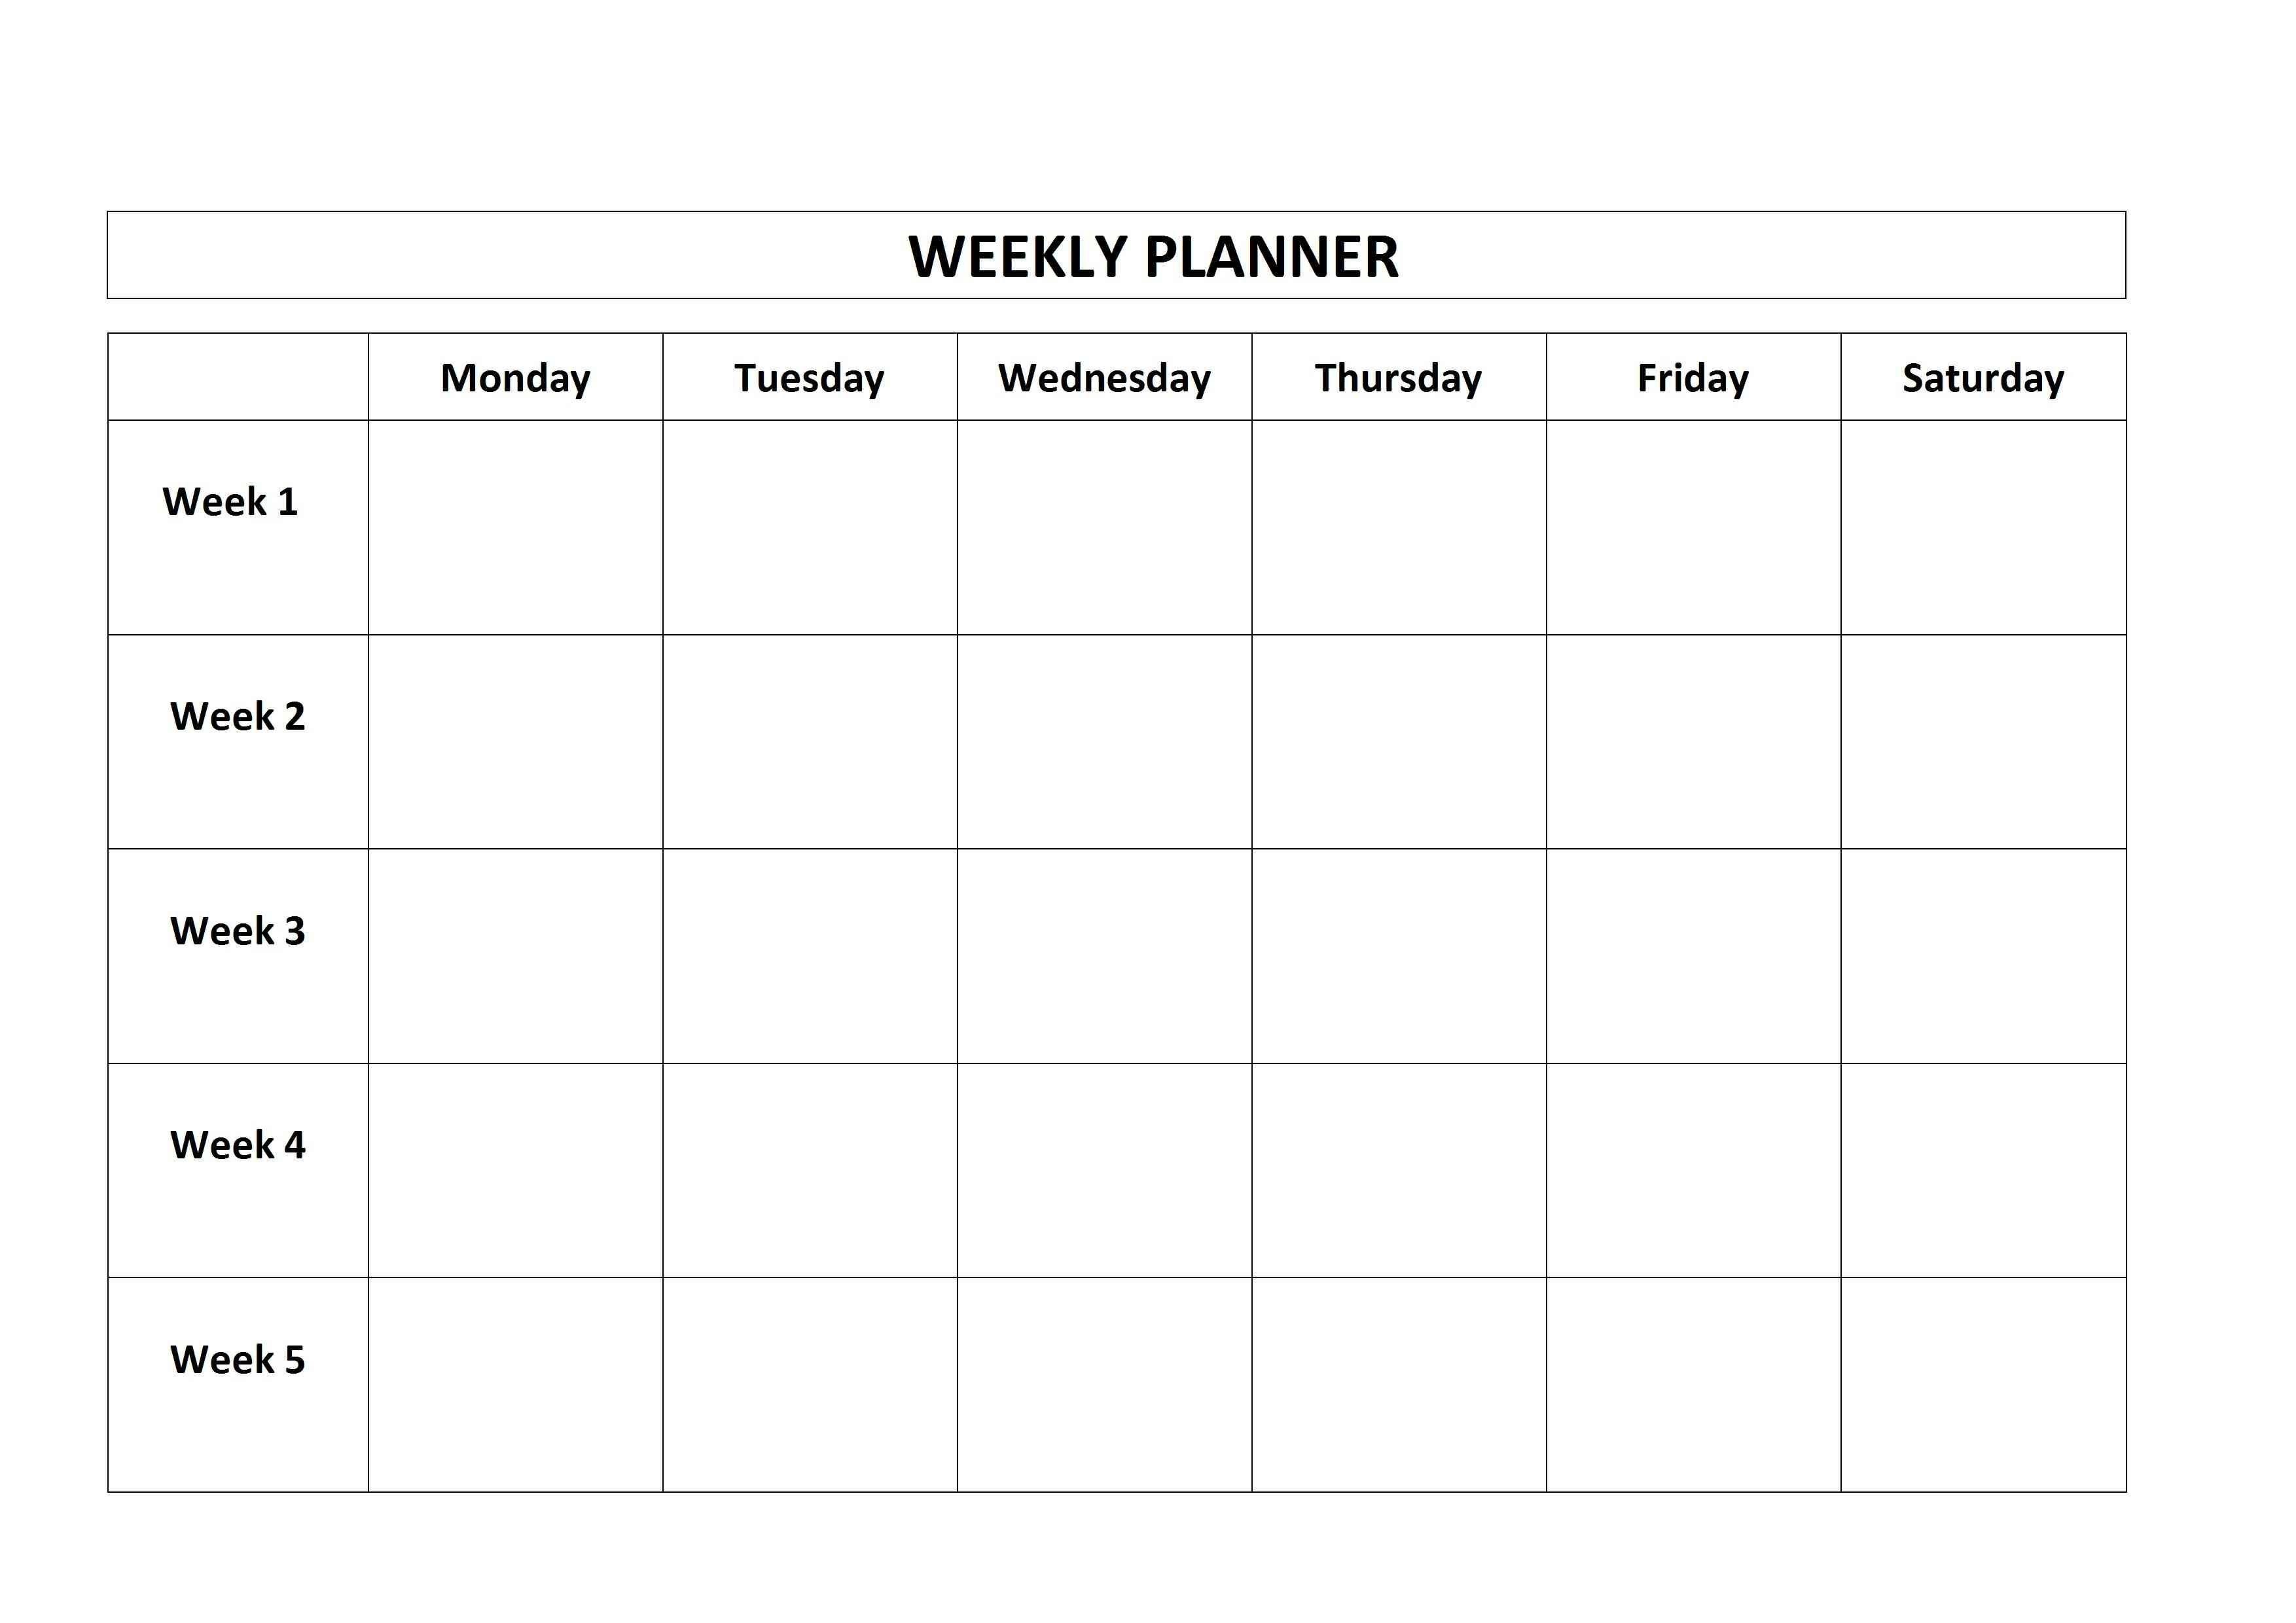 Free Printable Weekly Planner Monday Friday School Calendar Mon - Friday Weekly Celendar